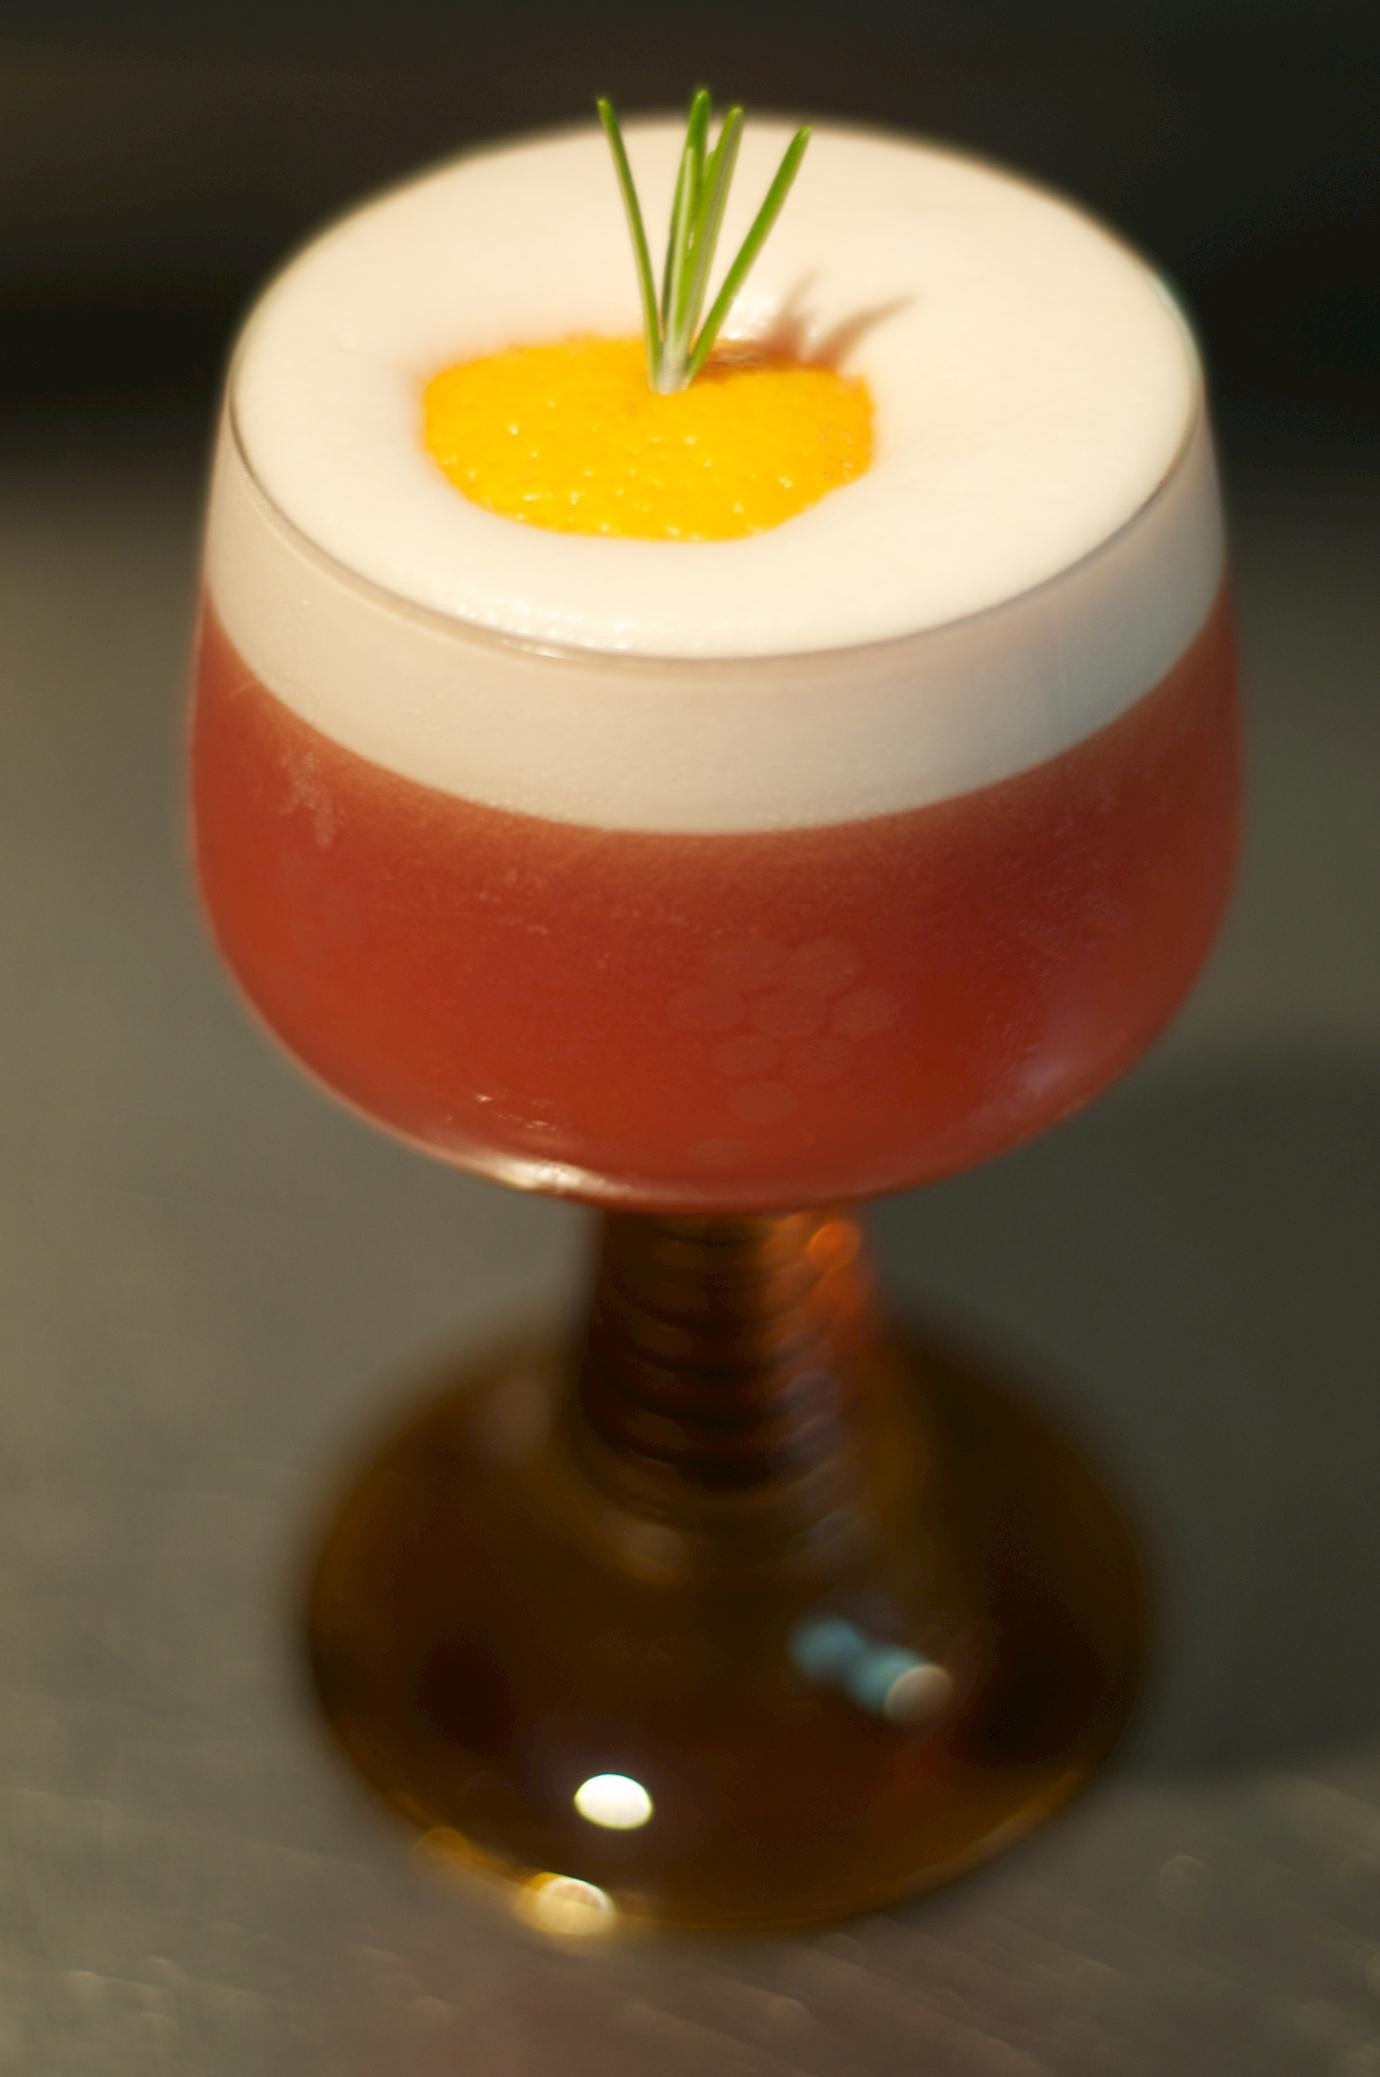 Bloody Ruby - 30ml gin10ml vermouth5ml Campari30ml blood orange20ml lemon juice5ml rosemary syrup20ml egg whiteShake over ice and pour